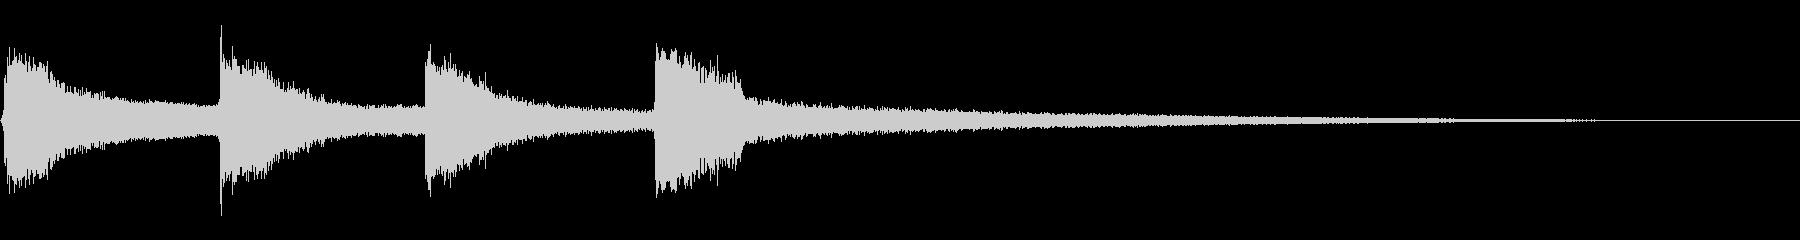 Bell-ジングル_03の未再生の波形